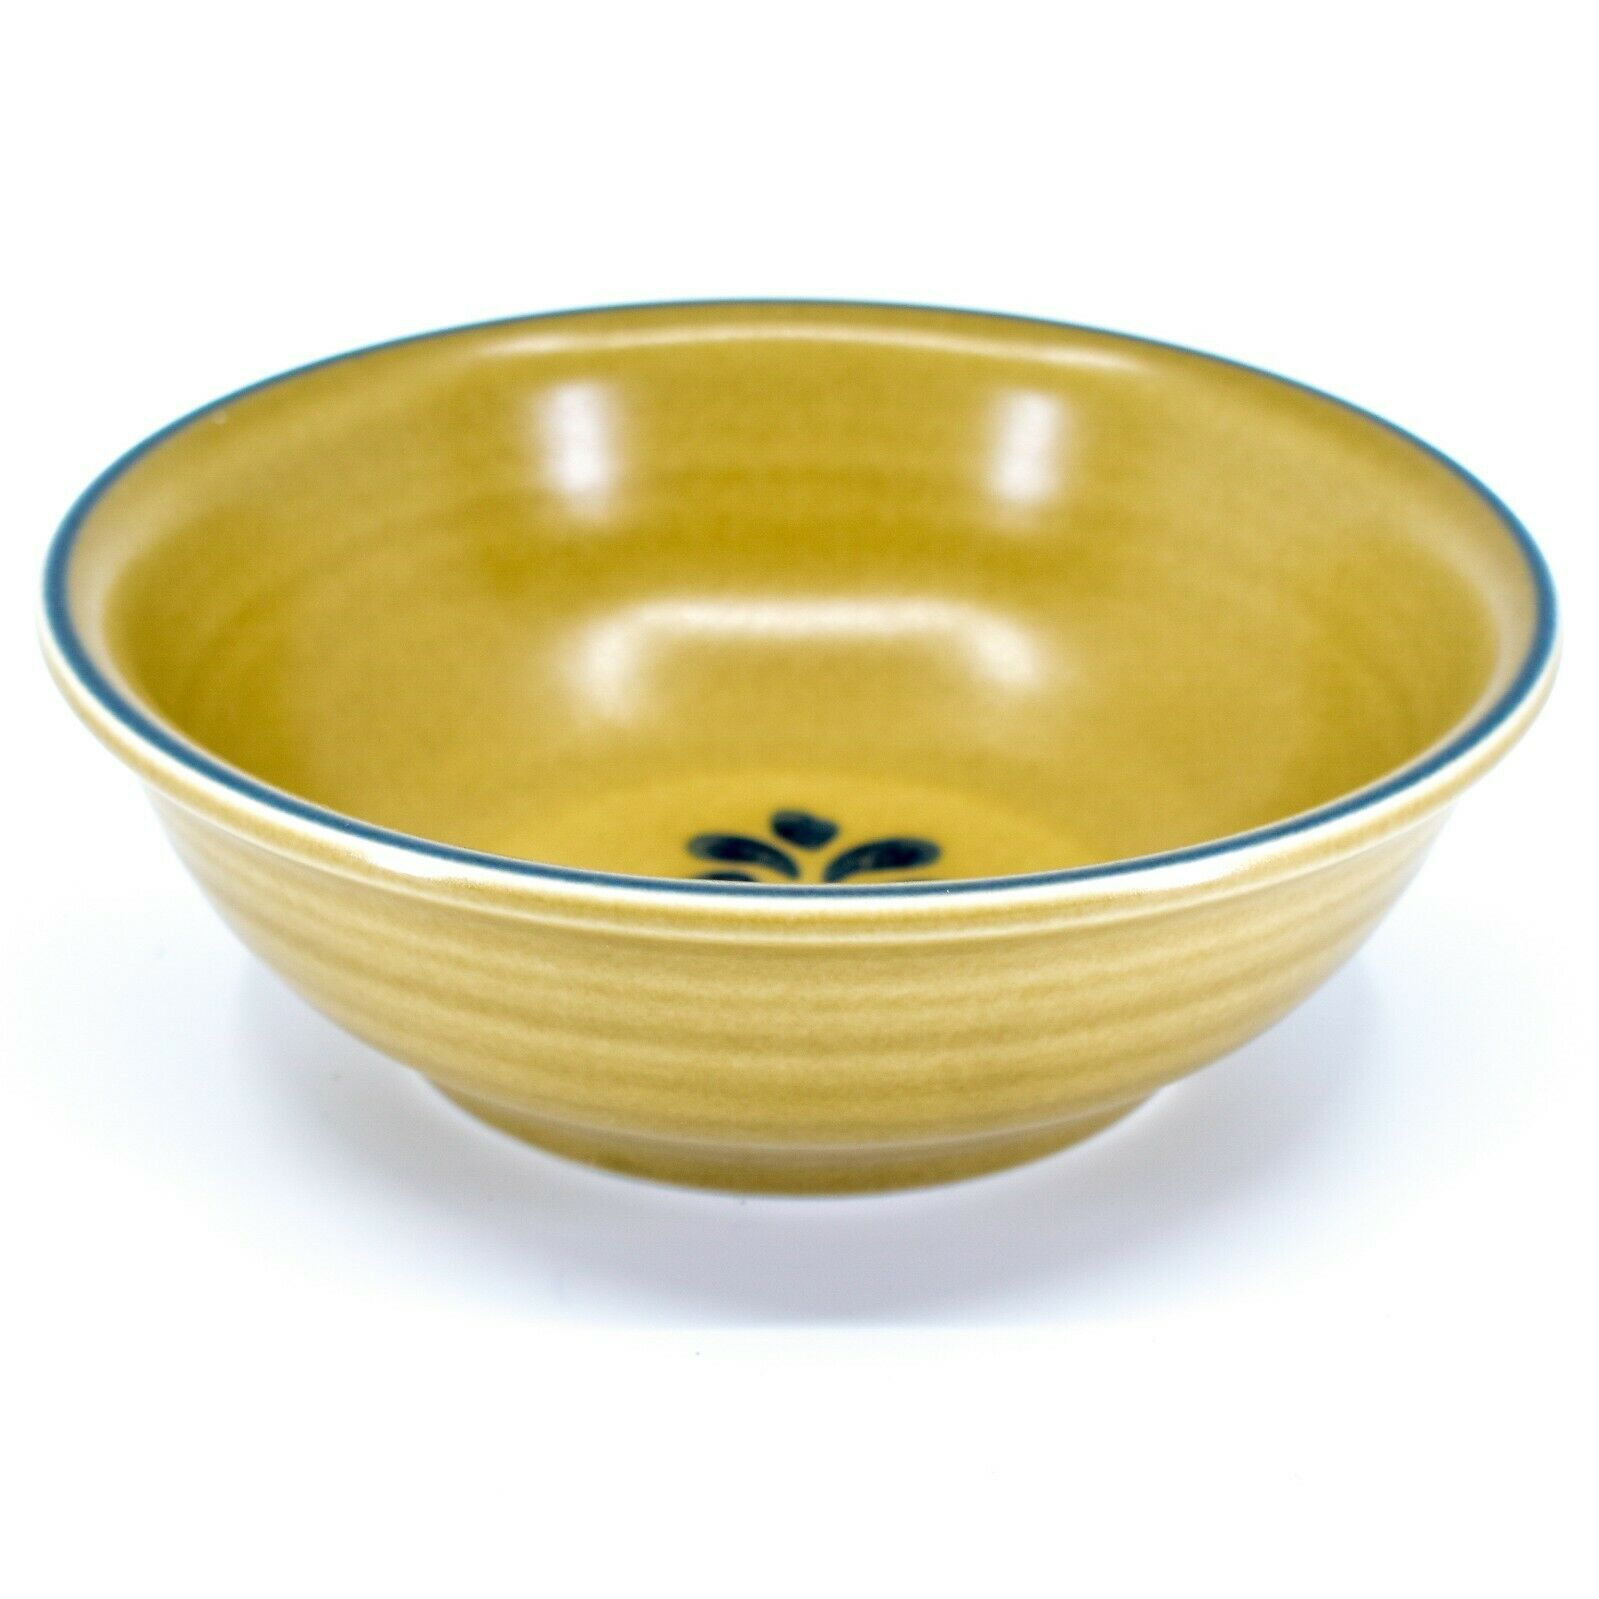 "Pfaltzgraff USA Folk Art 6"" Soup Cereal Bowl"